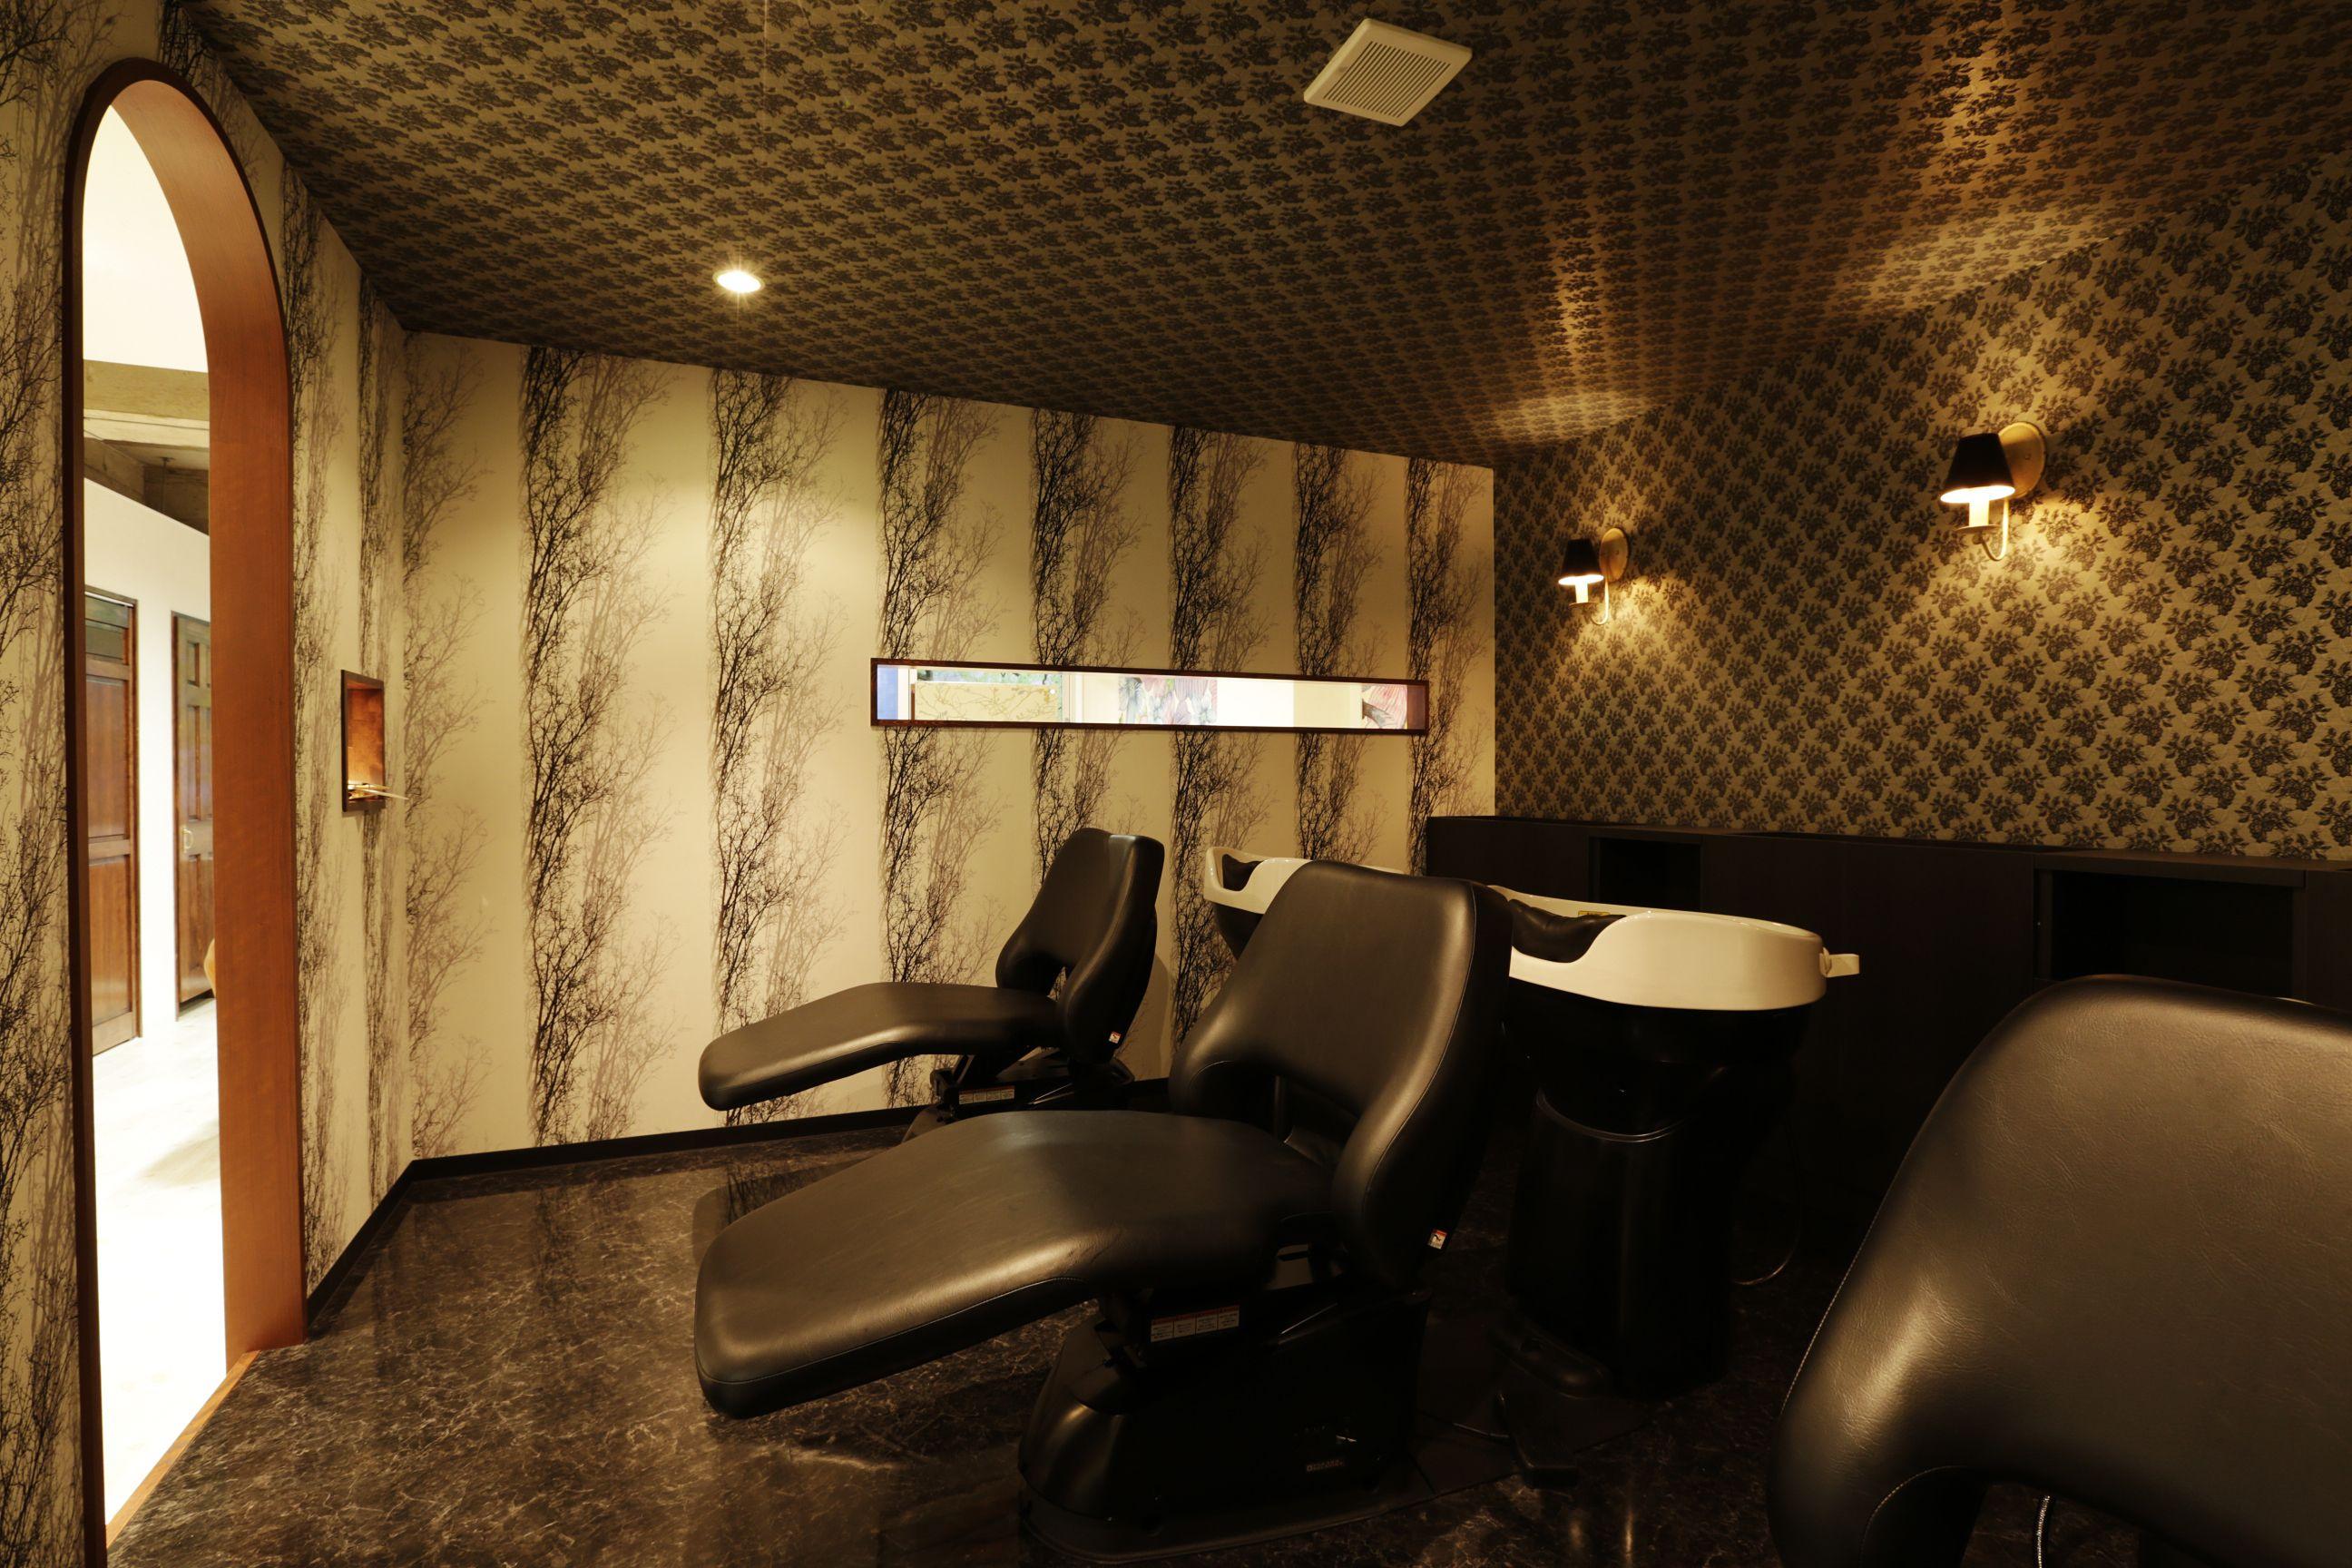 Beauty salon interior design ideas |  + shampoo + space + decor + Japan + designs  | Follow us on https://www.facebook.com/TracksGroup <<<【shine hair latte シャンプーエリア】 美容室 内装